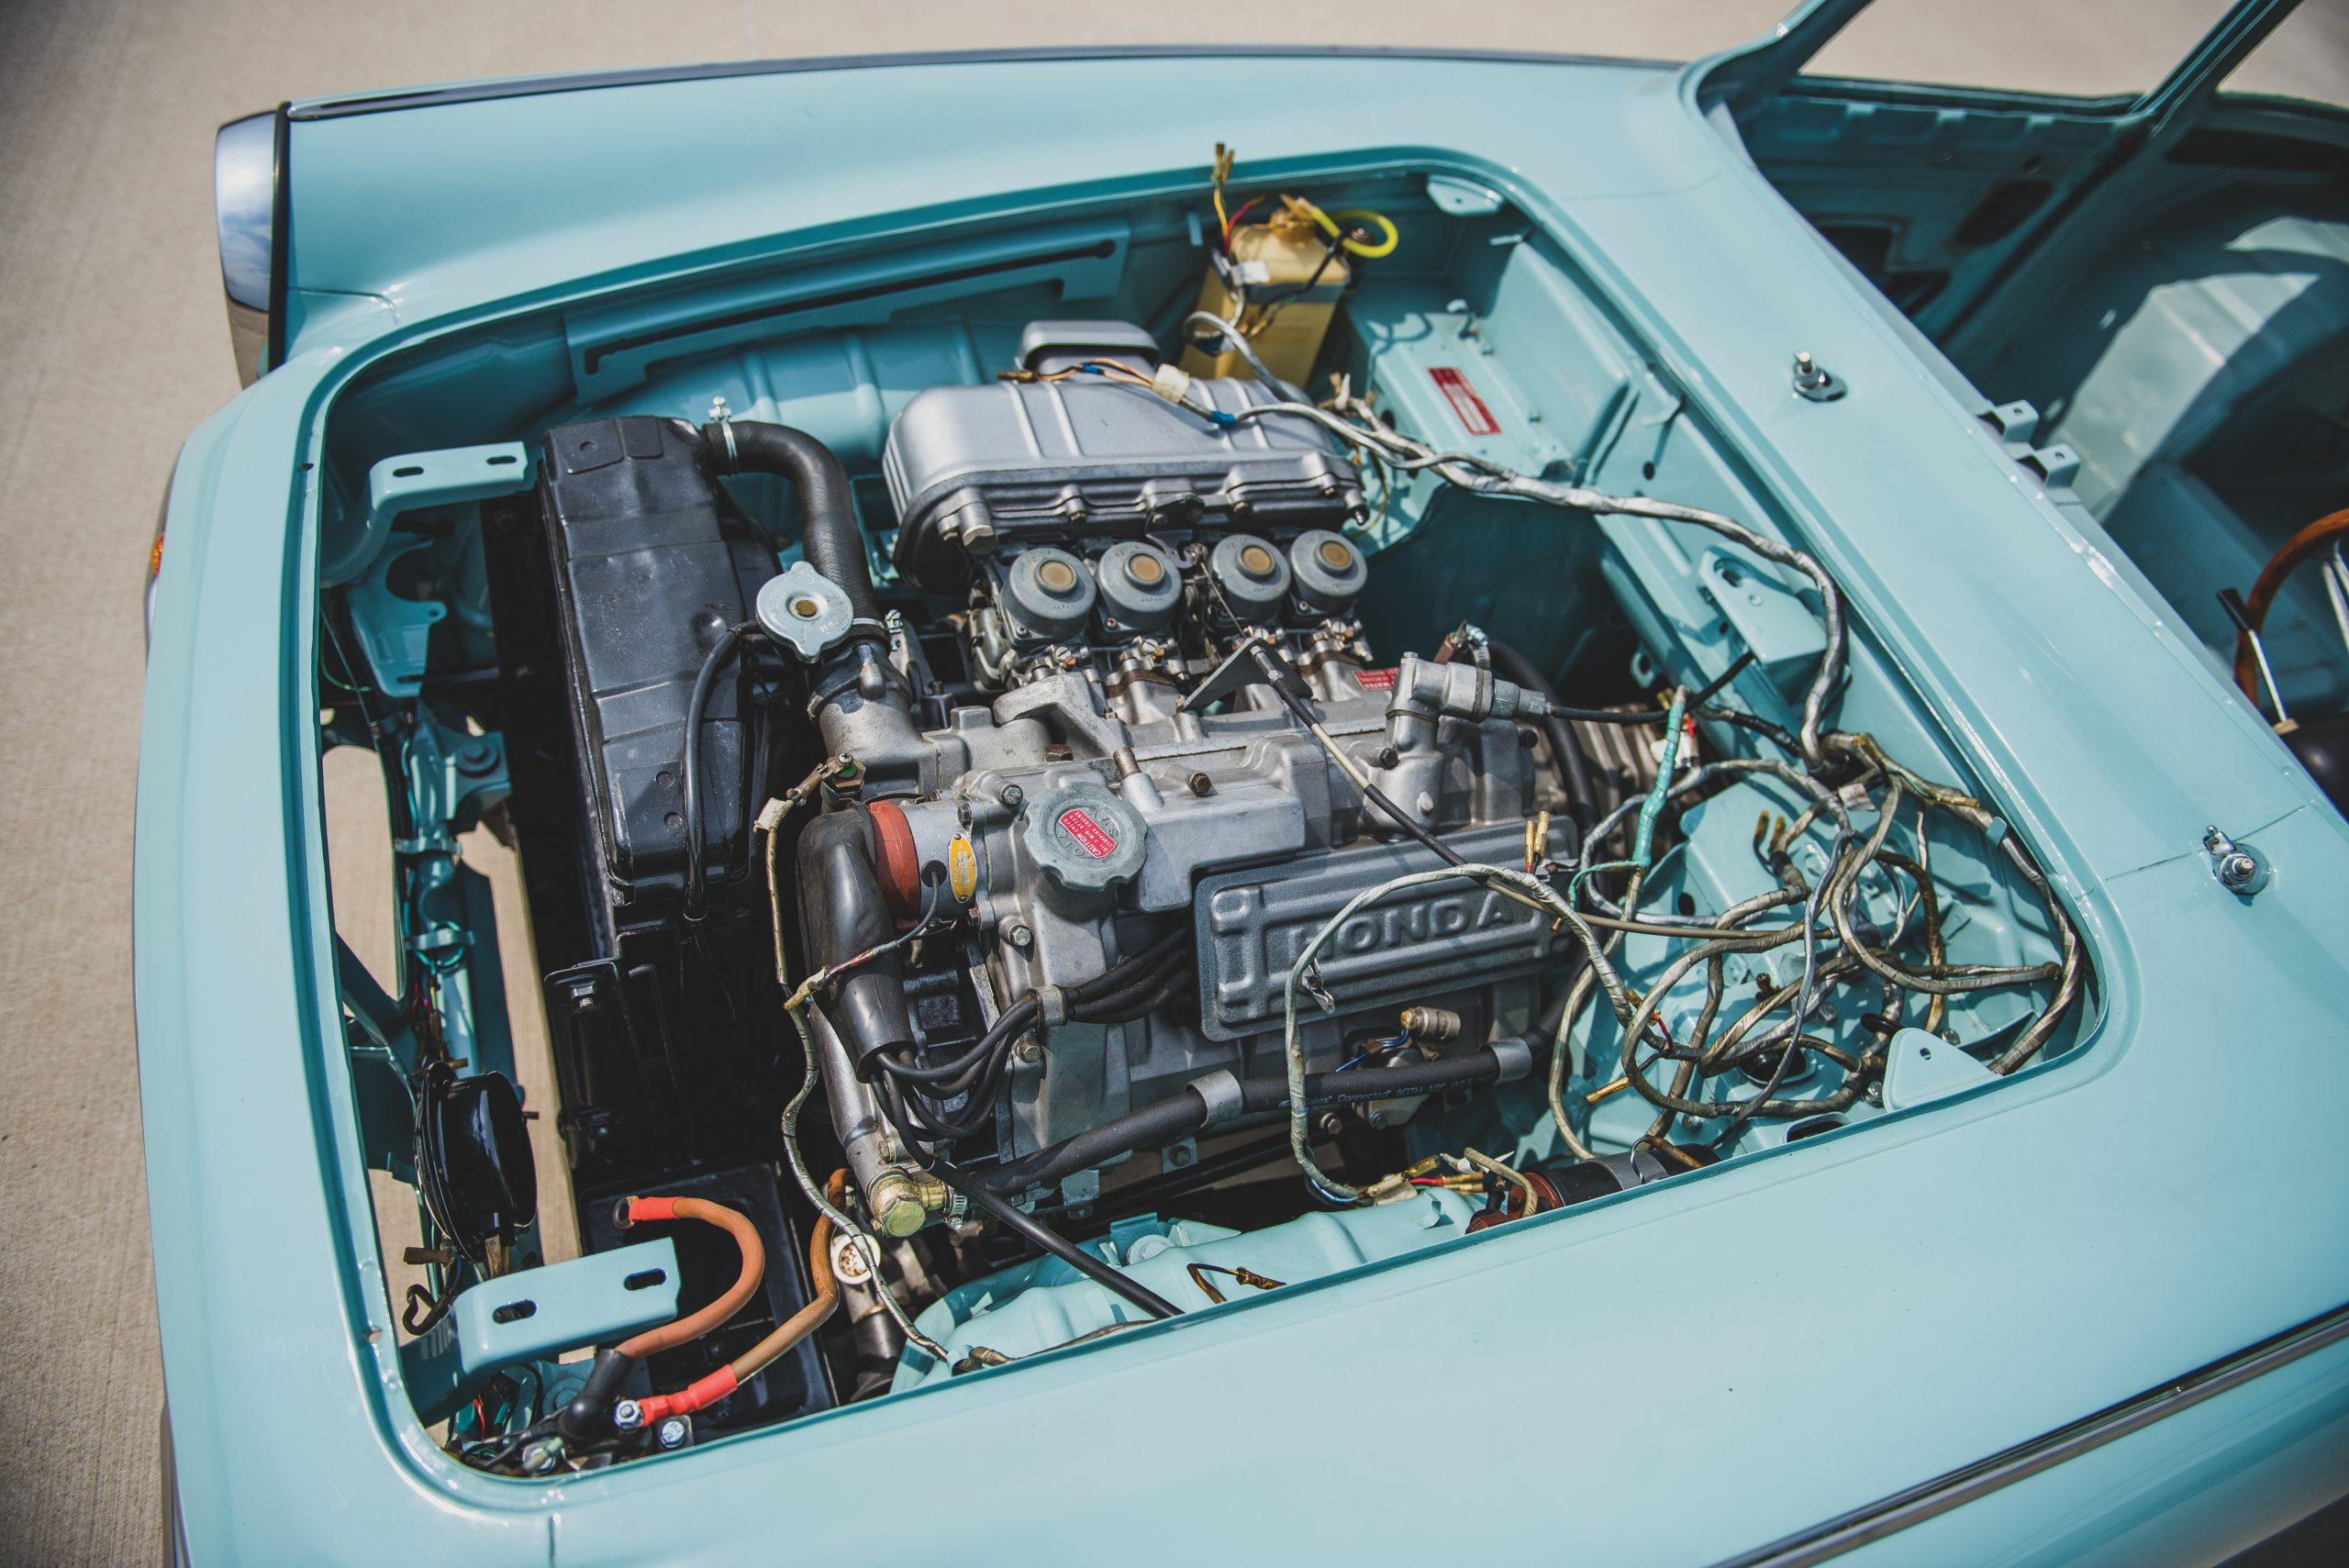 1966 Honda S600 Coupe engine